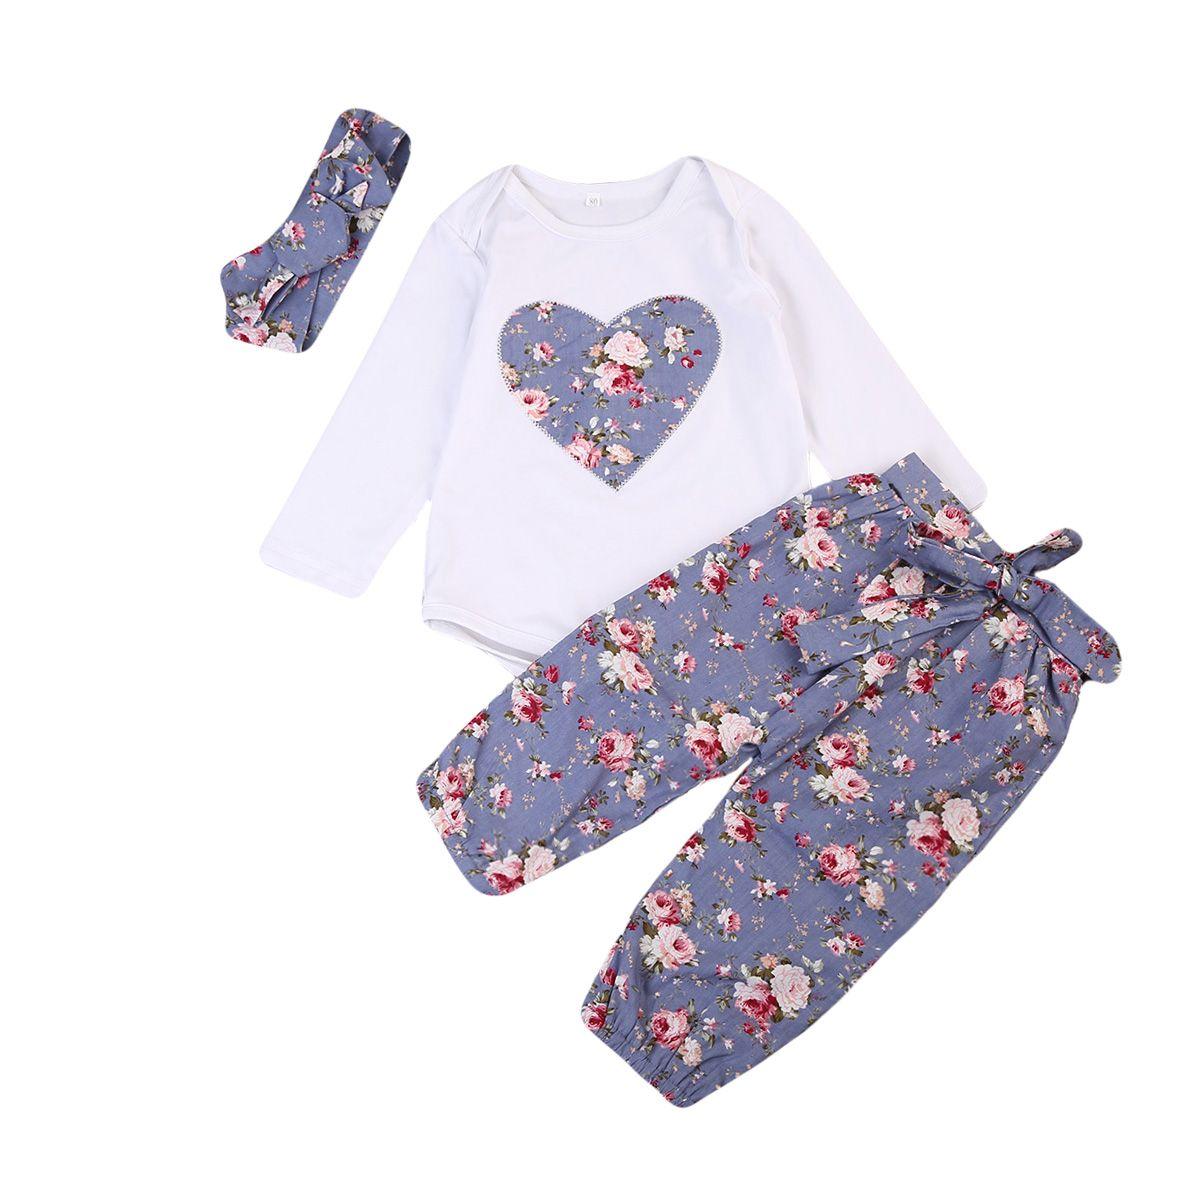 3 unids recién nacido Niño niña Sets ropa floral jumpsuit romper + Pantalones + Headband outfits